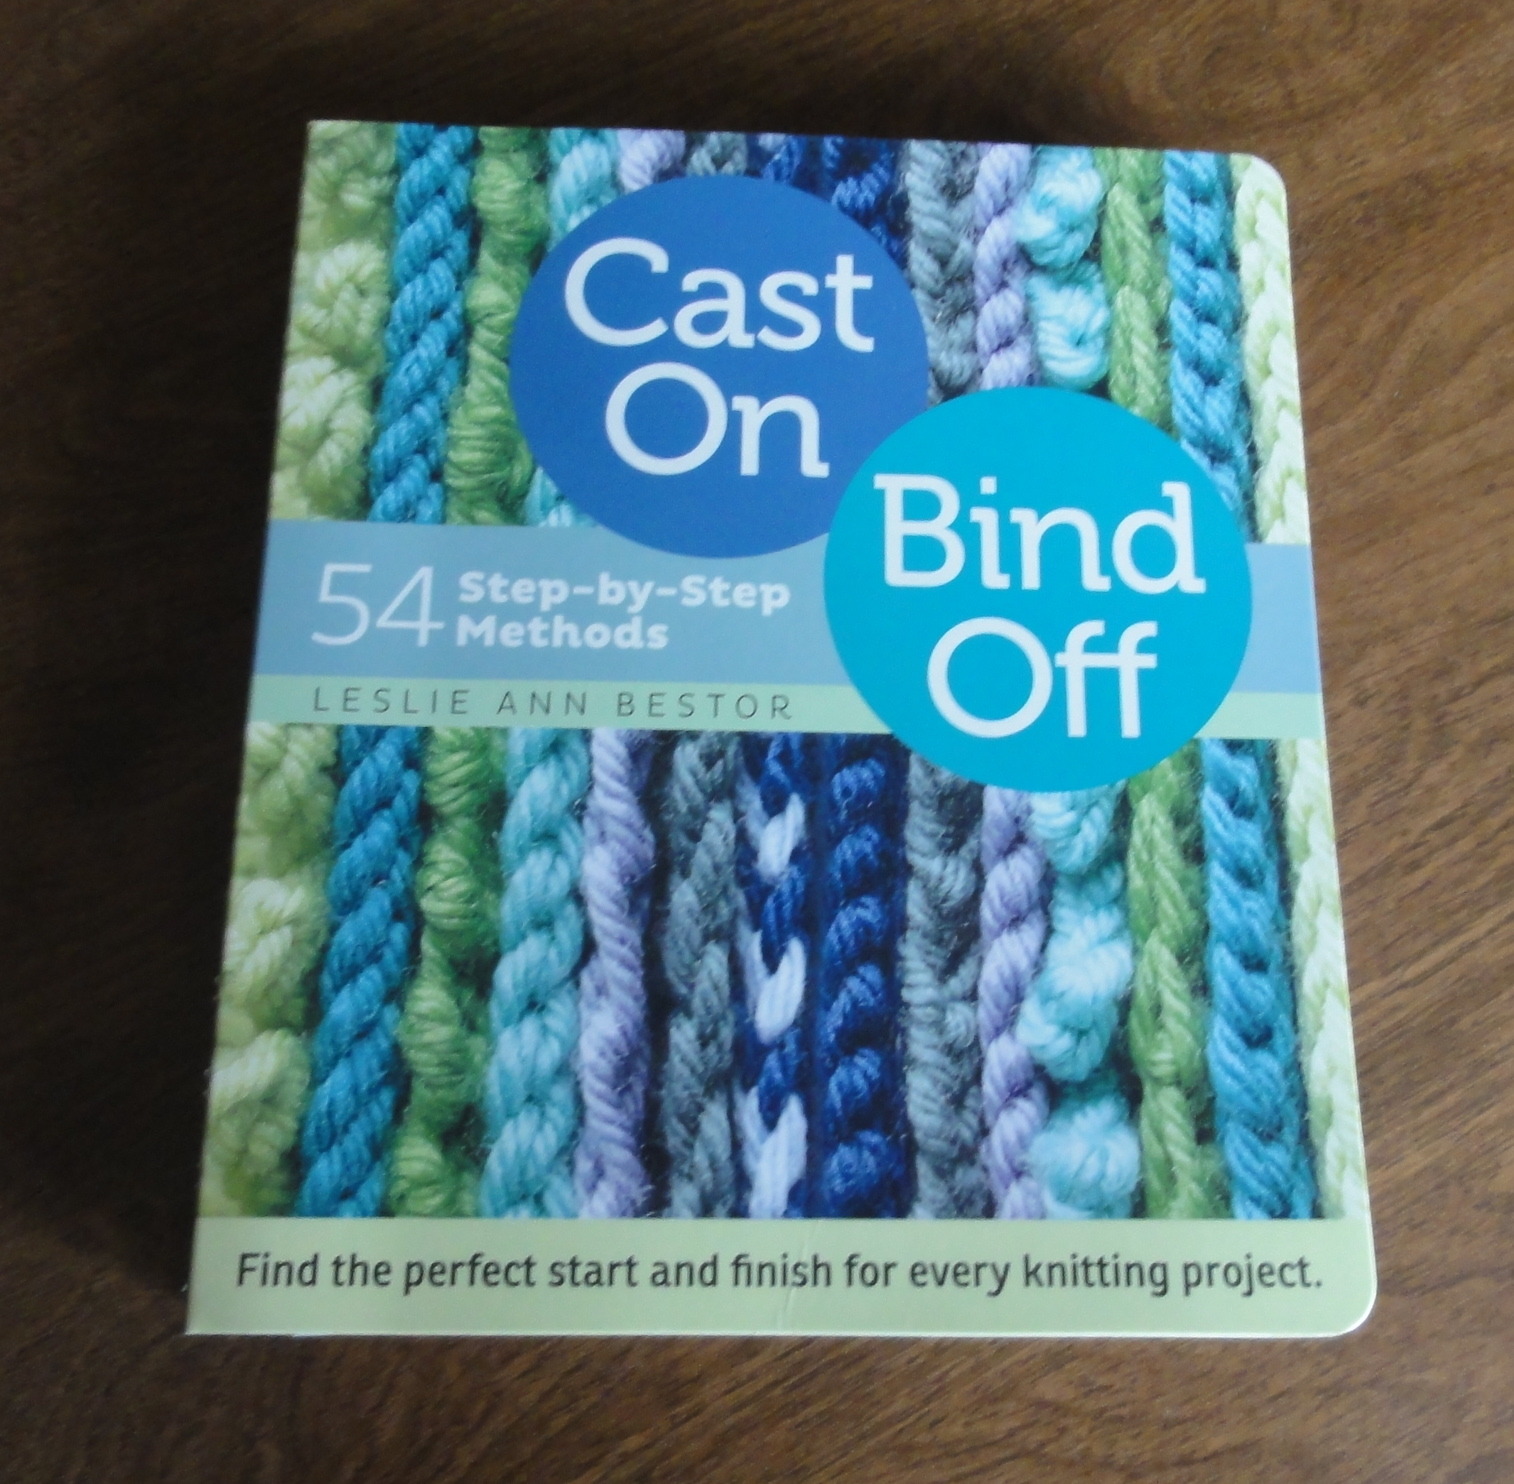 cast on bind off bestor leslie ann